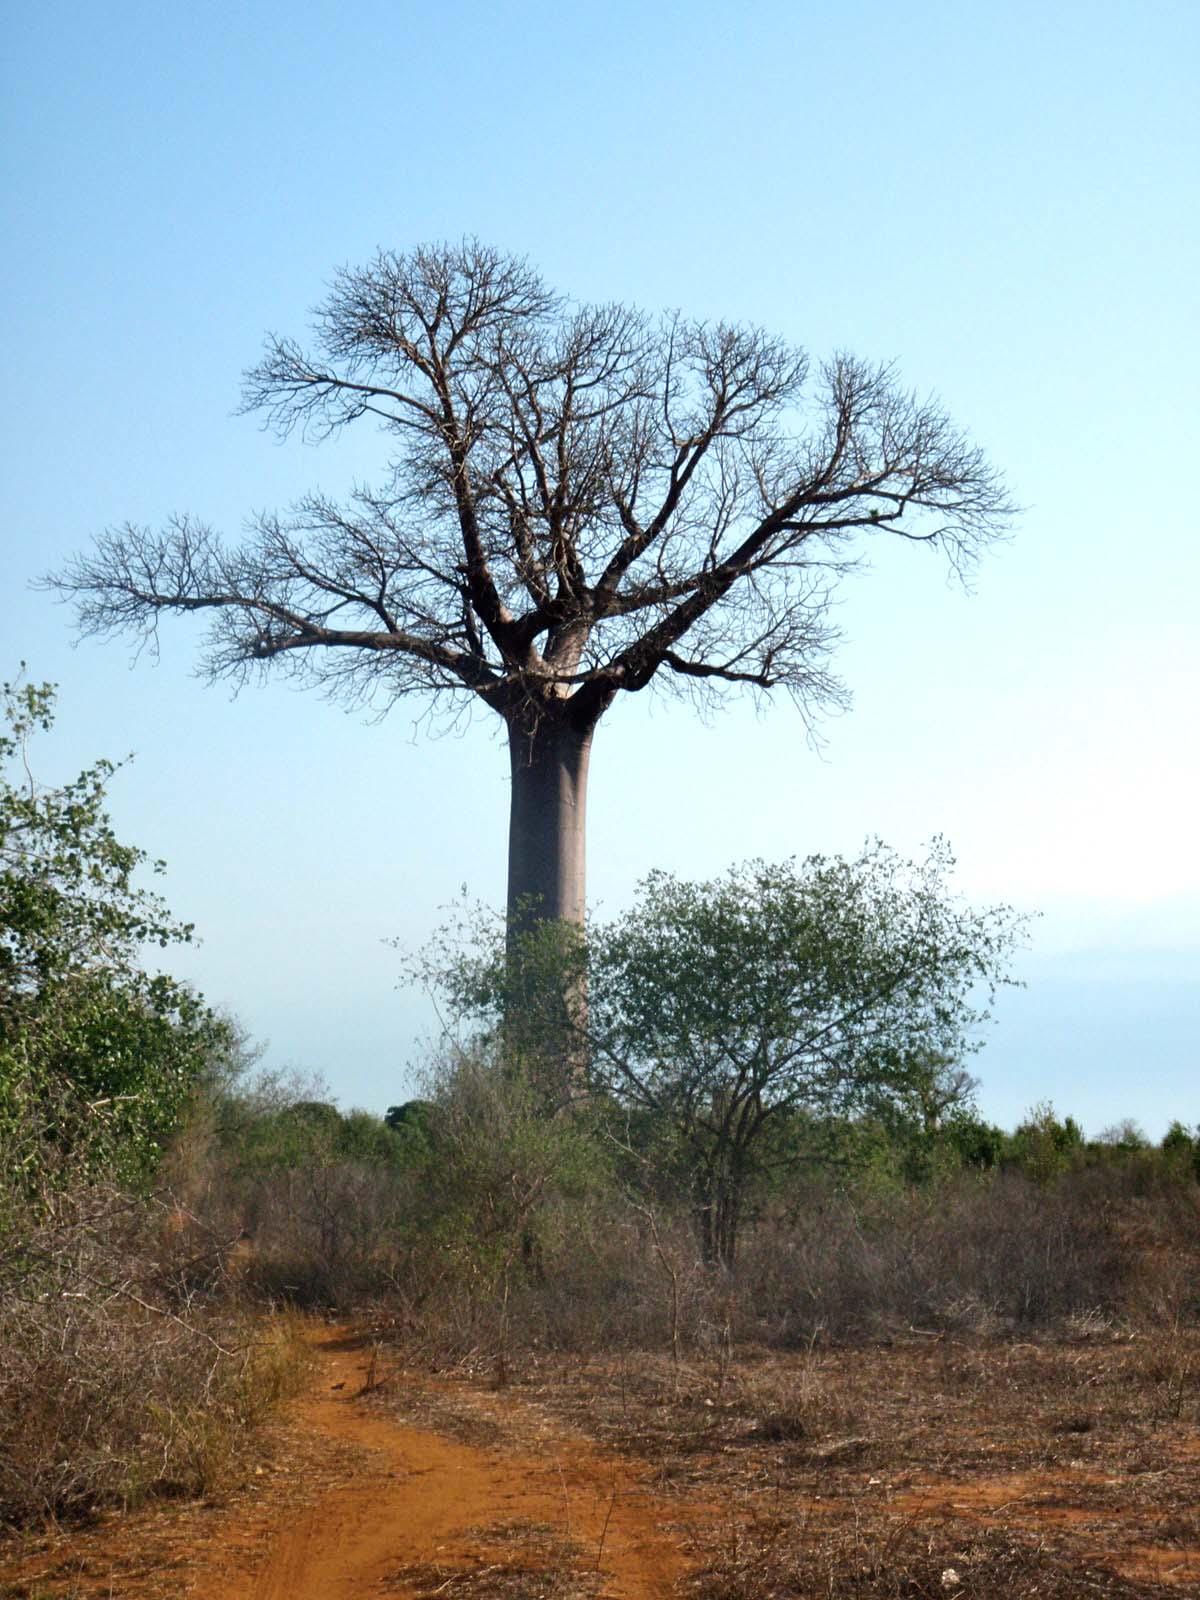 Baobab, Adansonia za